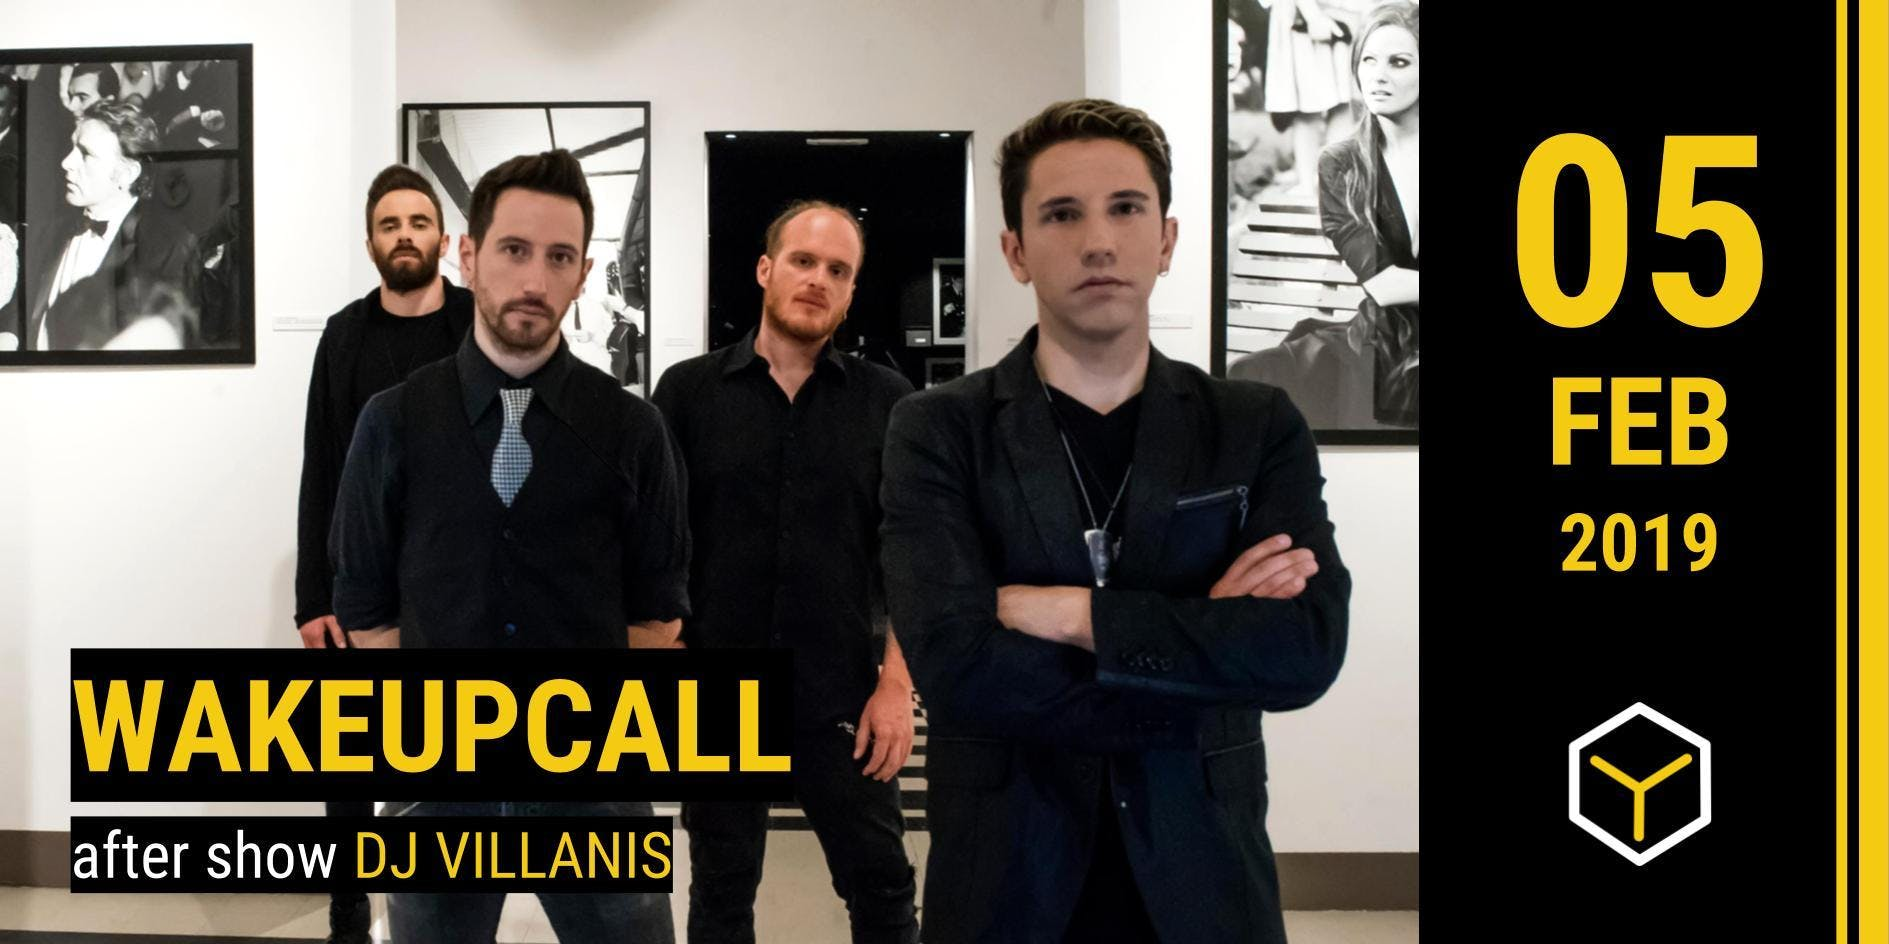 WakeUpCall - The Yellow Bar